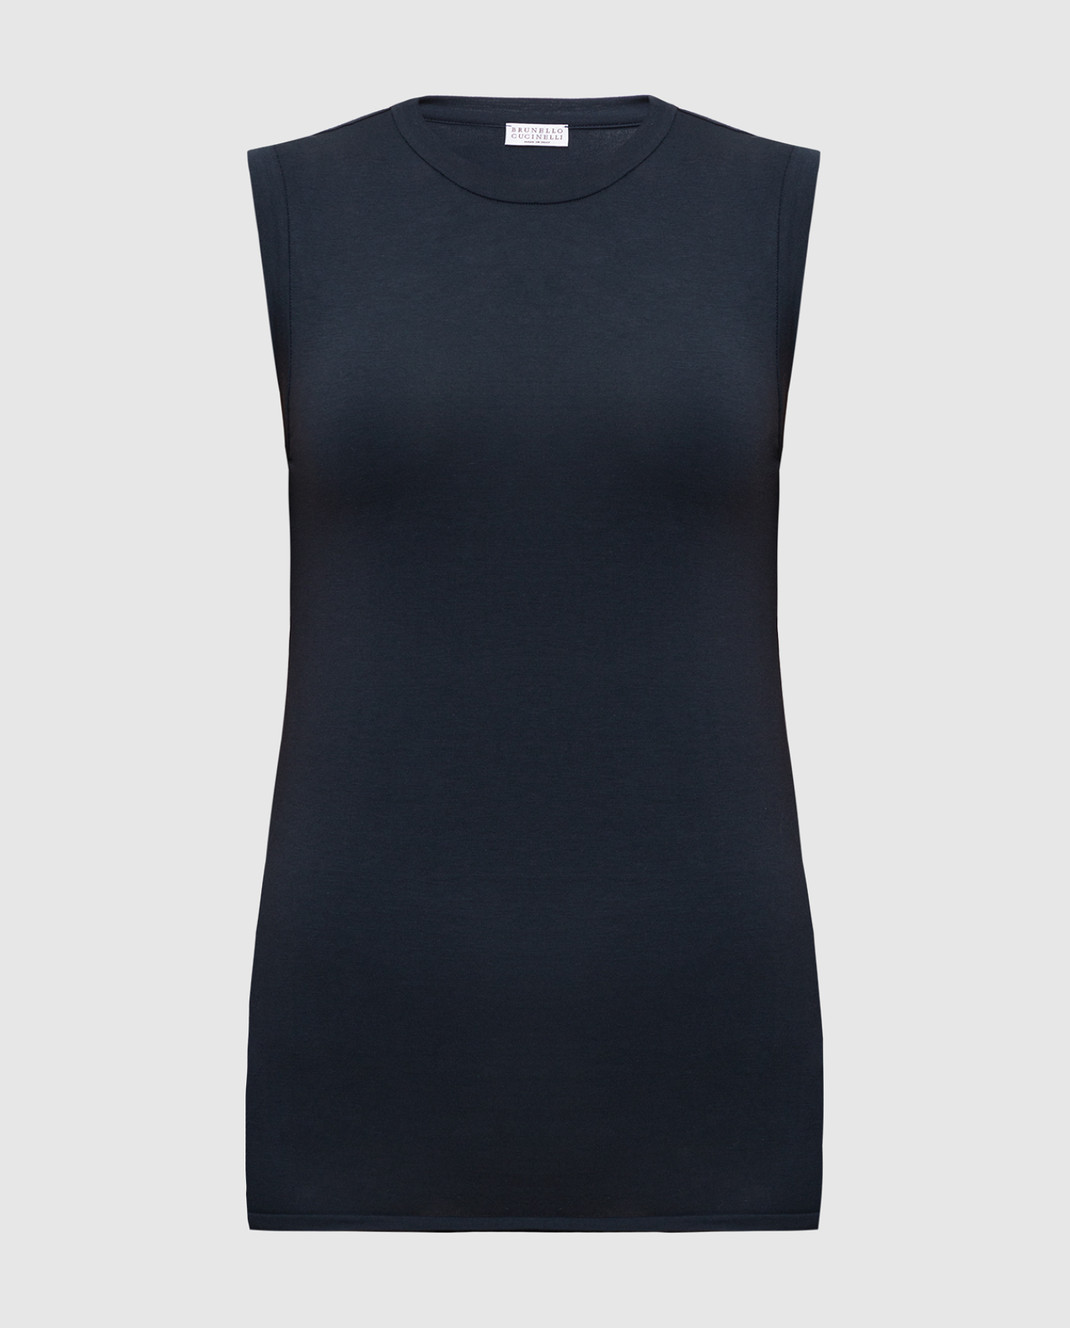 Brunello Cucinelli Темно-синий топ M0T18B0180